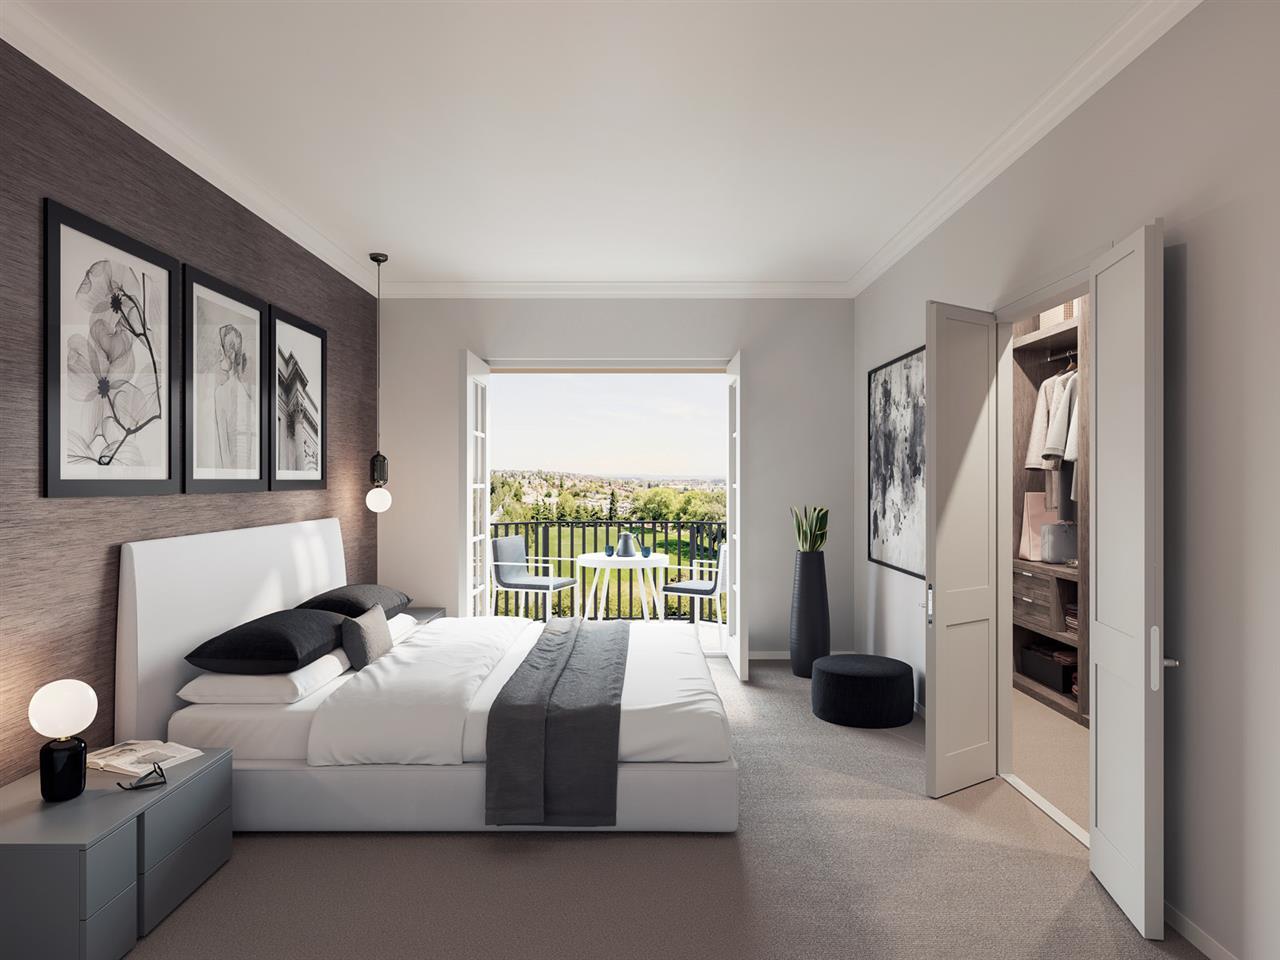 Condo Apartment at 2 450 W 59TH AVENUE, Unit 2, Vancouver West, British Columbia. Image 4